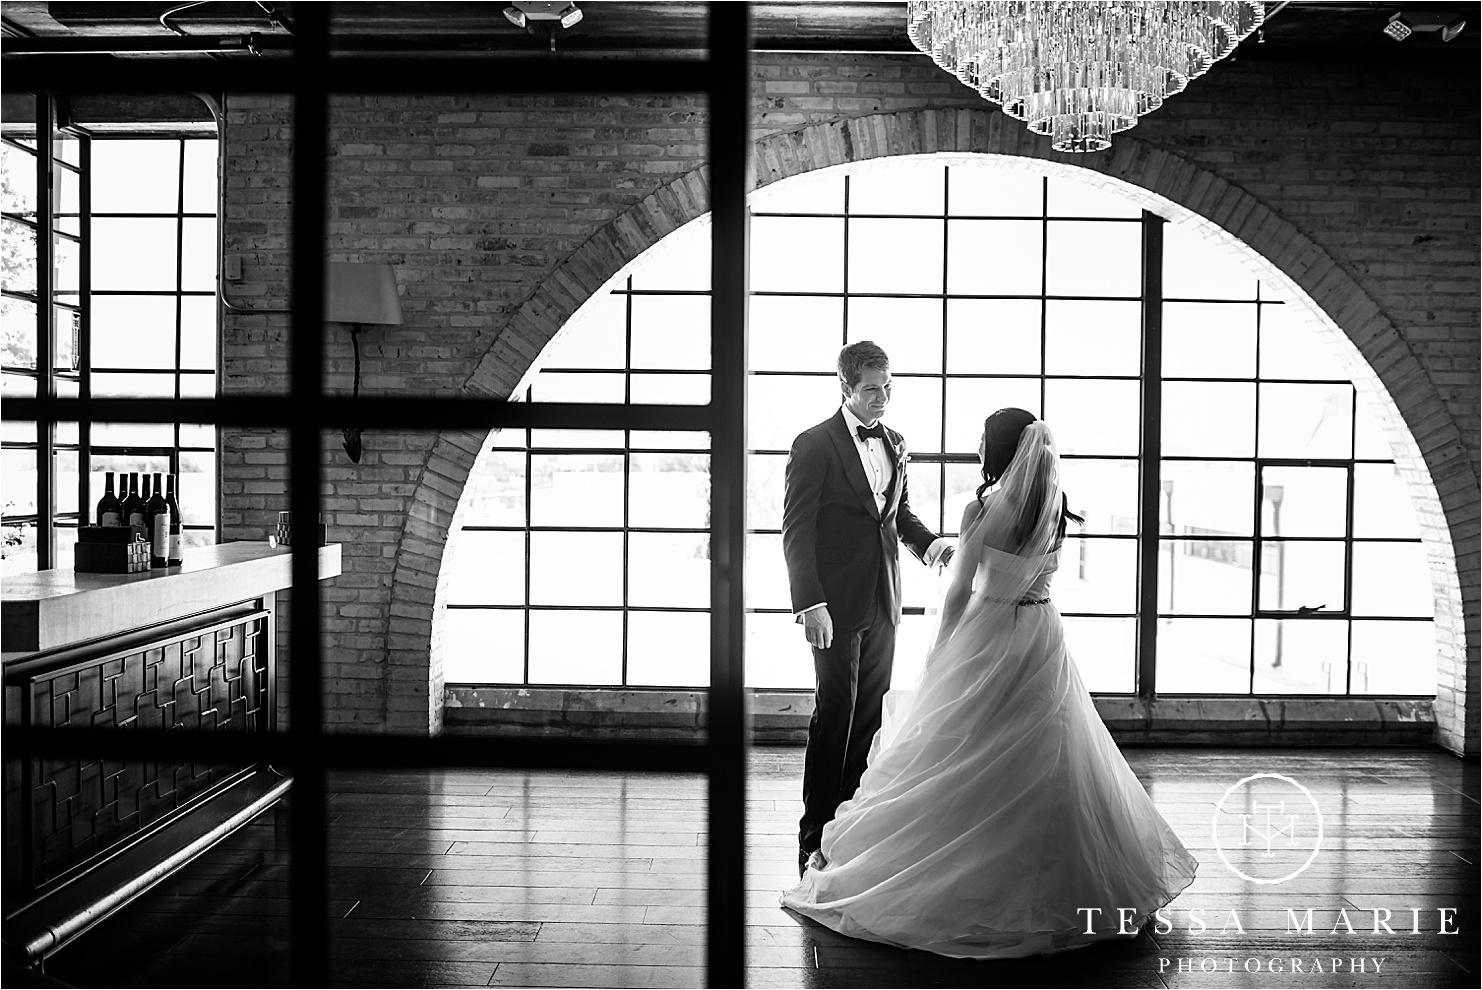 Tessa_marie_weddings_houston_wedding_photographer_The_astorian_0066.jpg